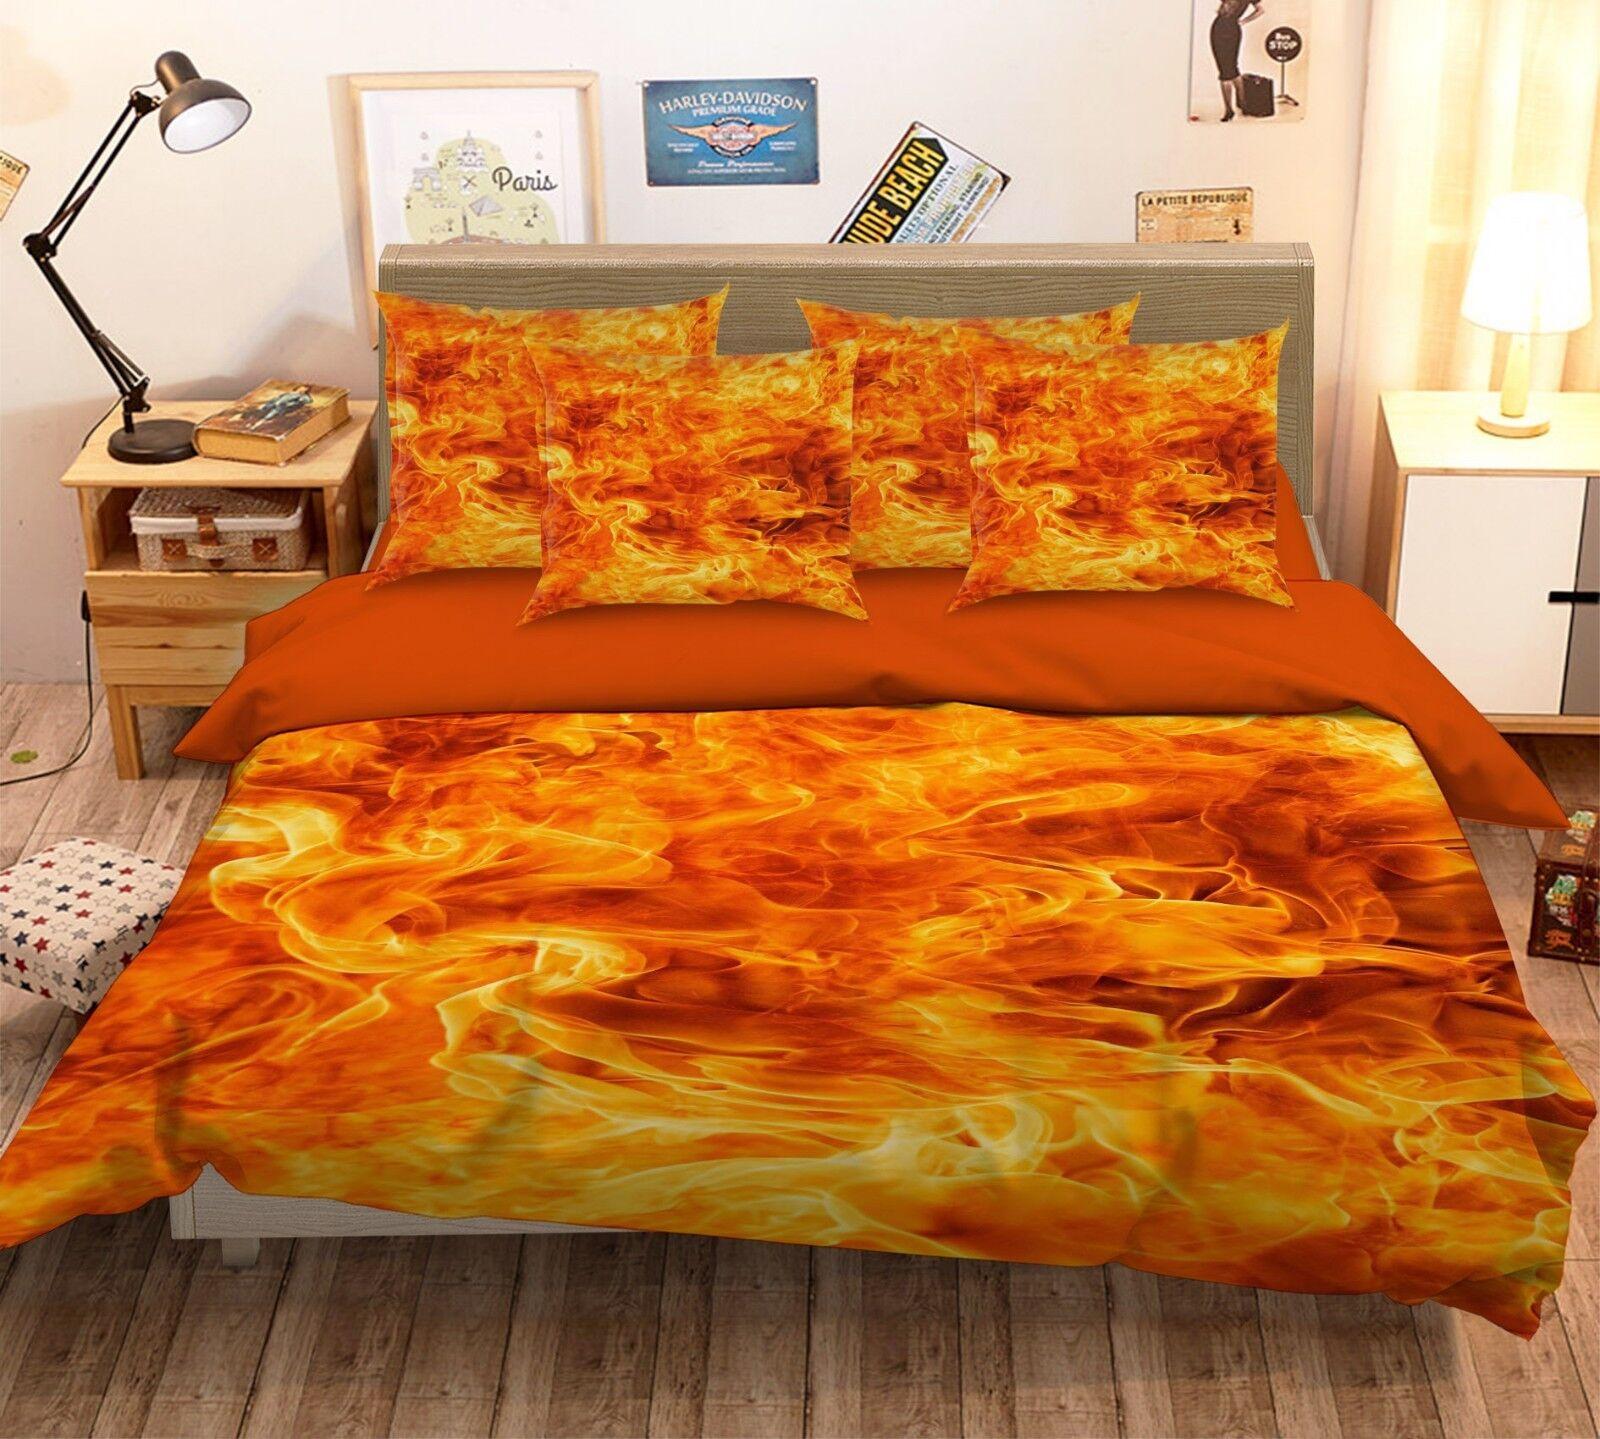 3D Warm Flame 46 Bett Pillowcases Quilt Duvet Startseite Set Single Königin König AU Cobb